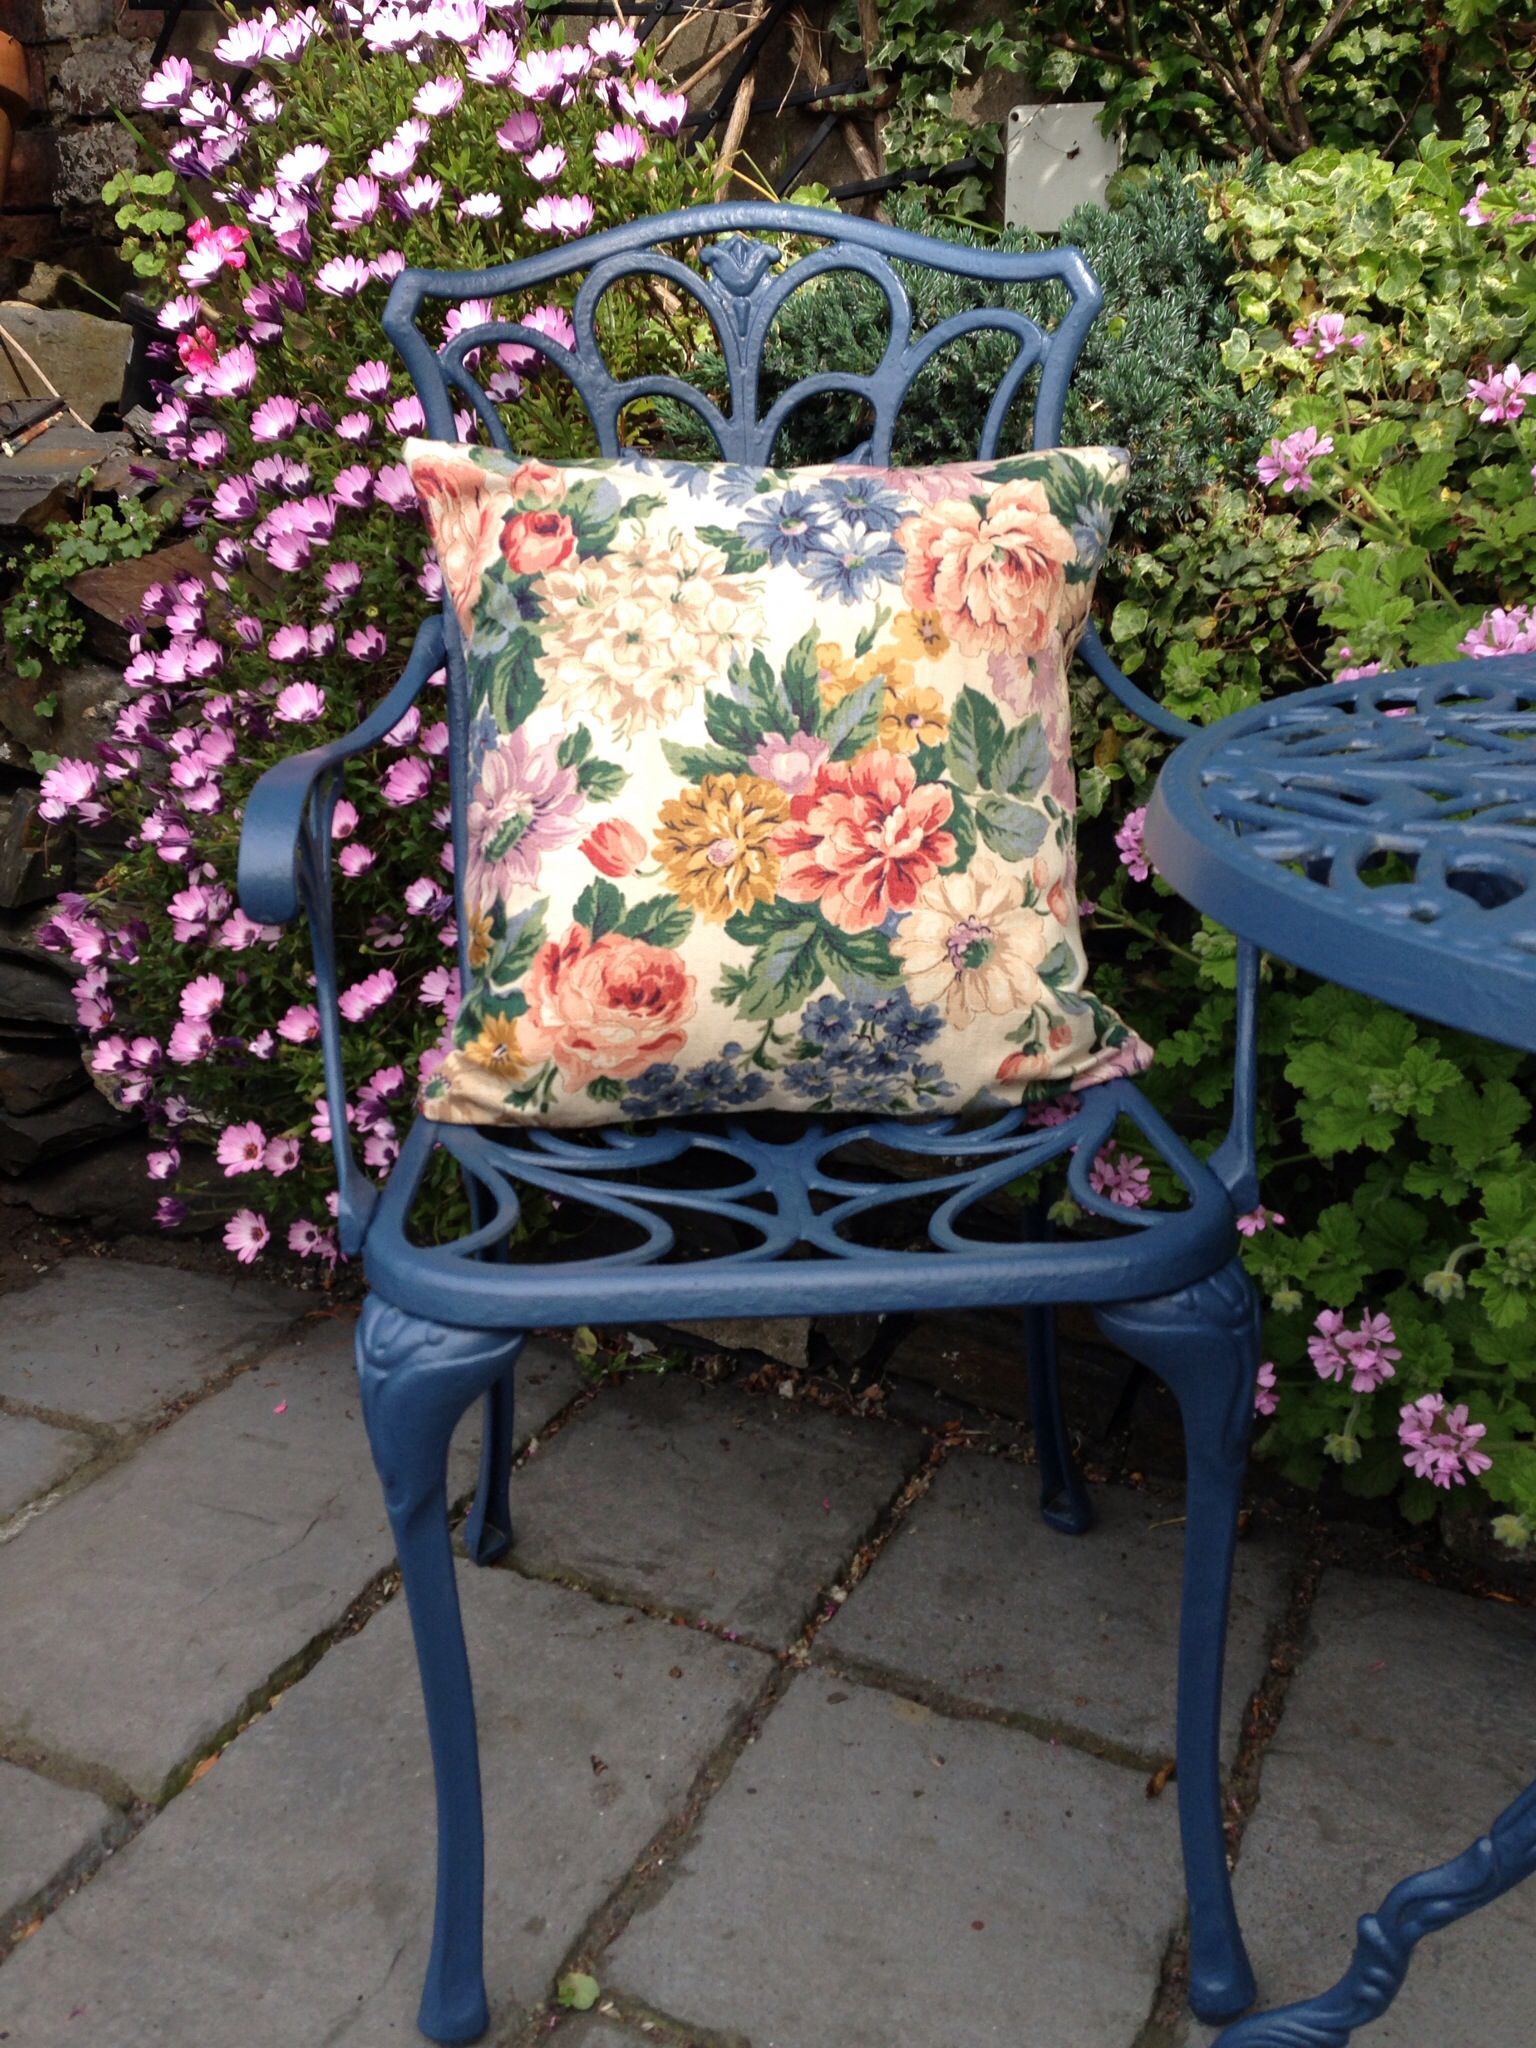 Painted garden furniture in Farrow & Ball Stiffkey Blue